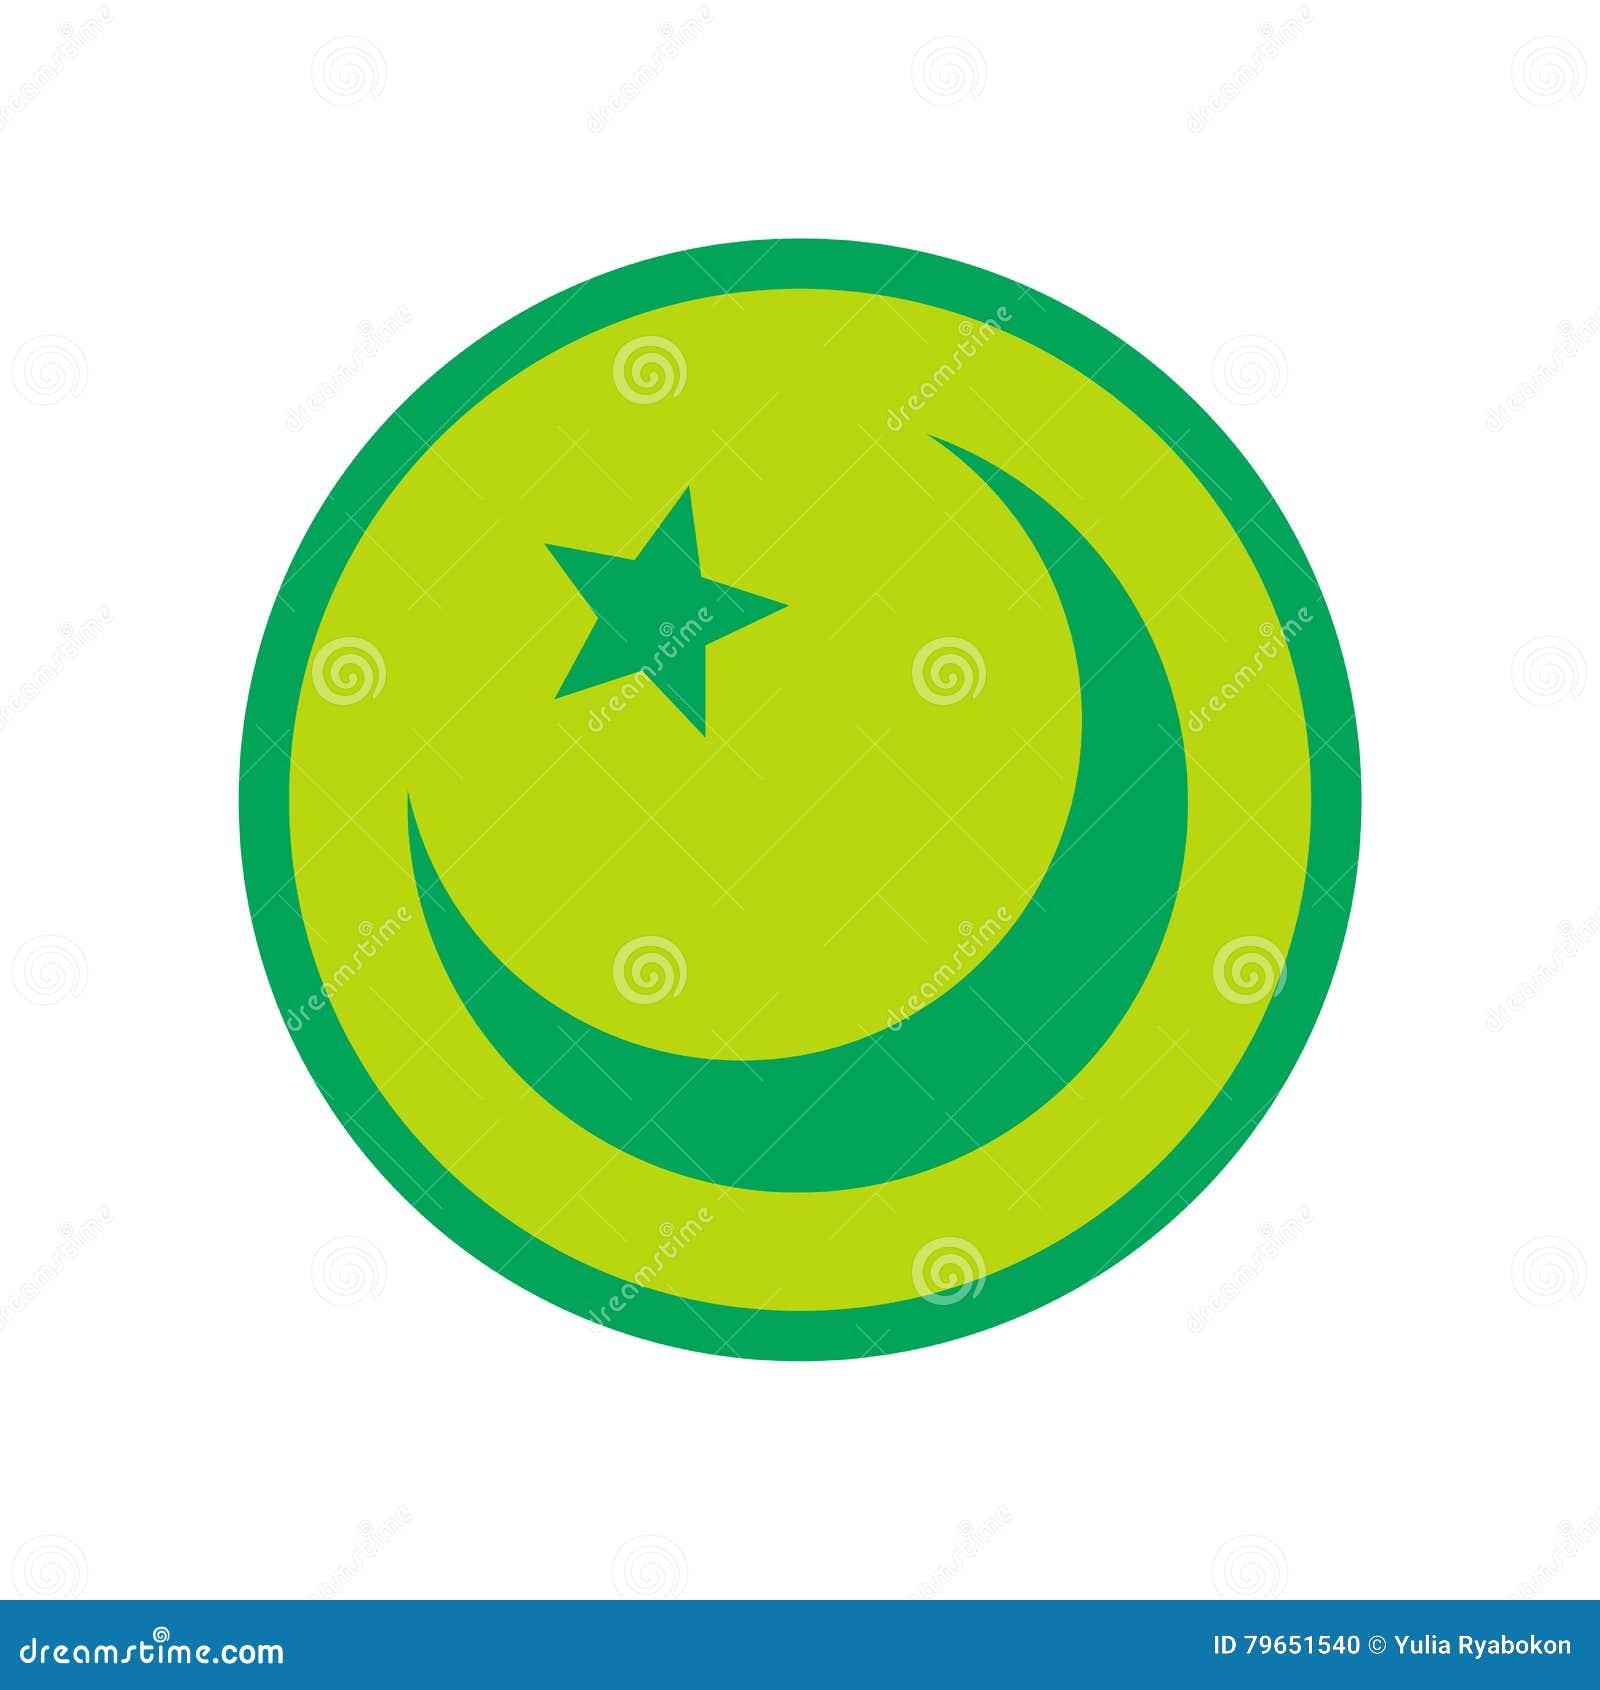 Islam Symbol Flat Icon Stock Vector Illustration Of Plain 79651540